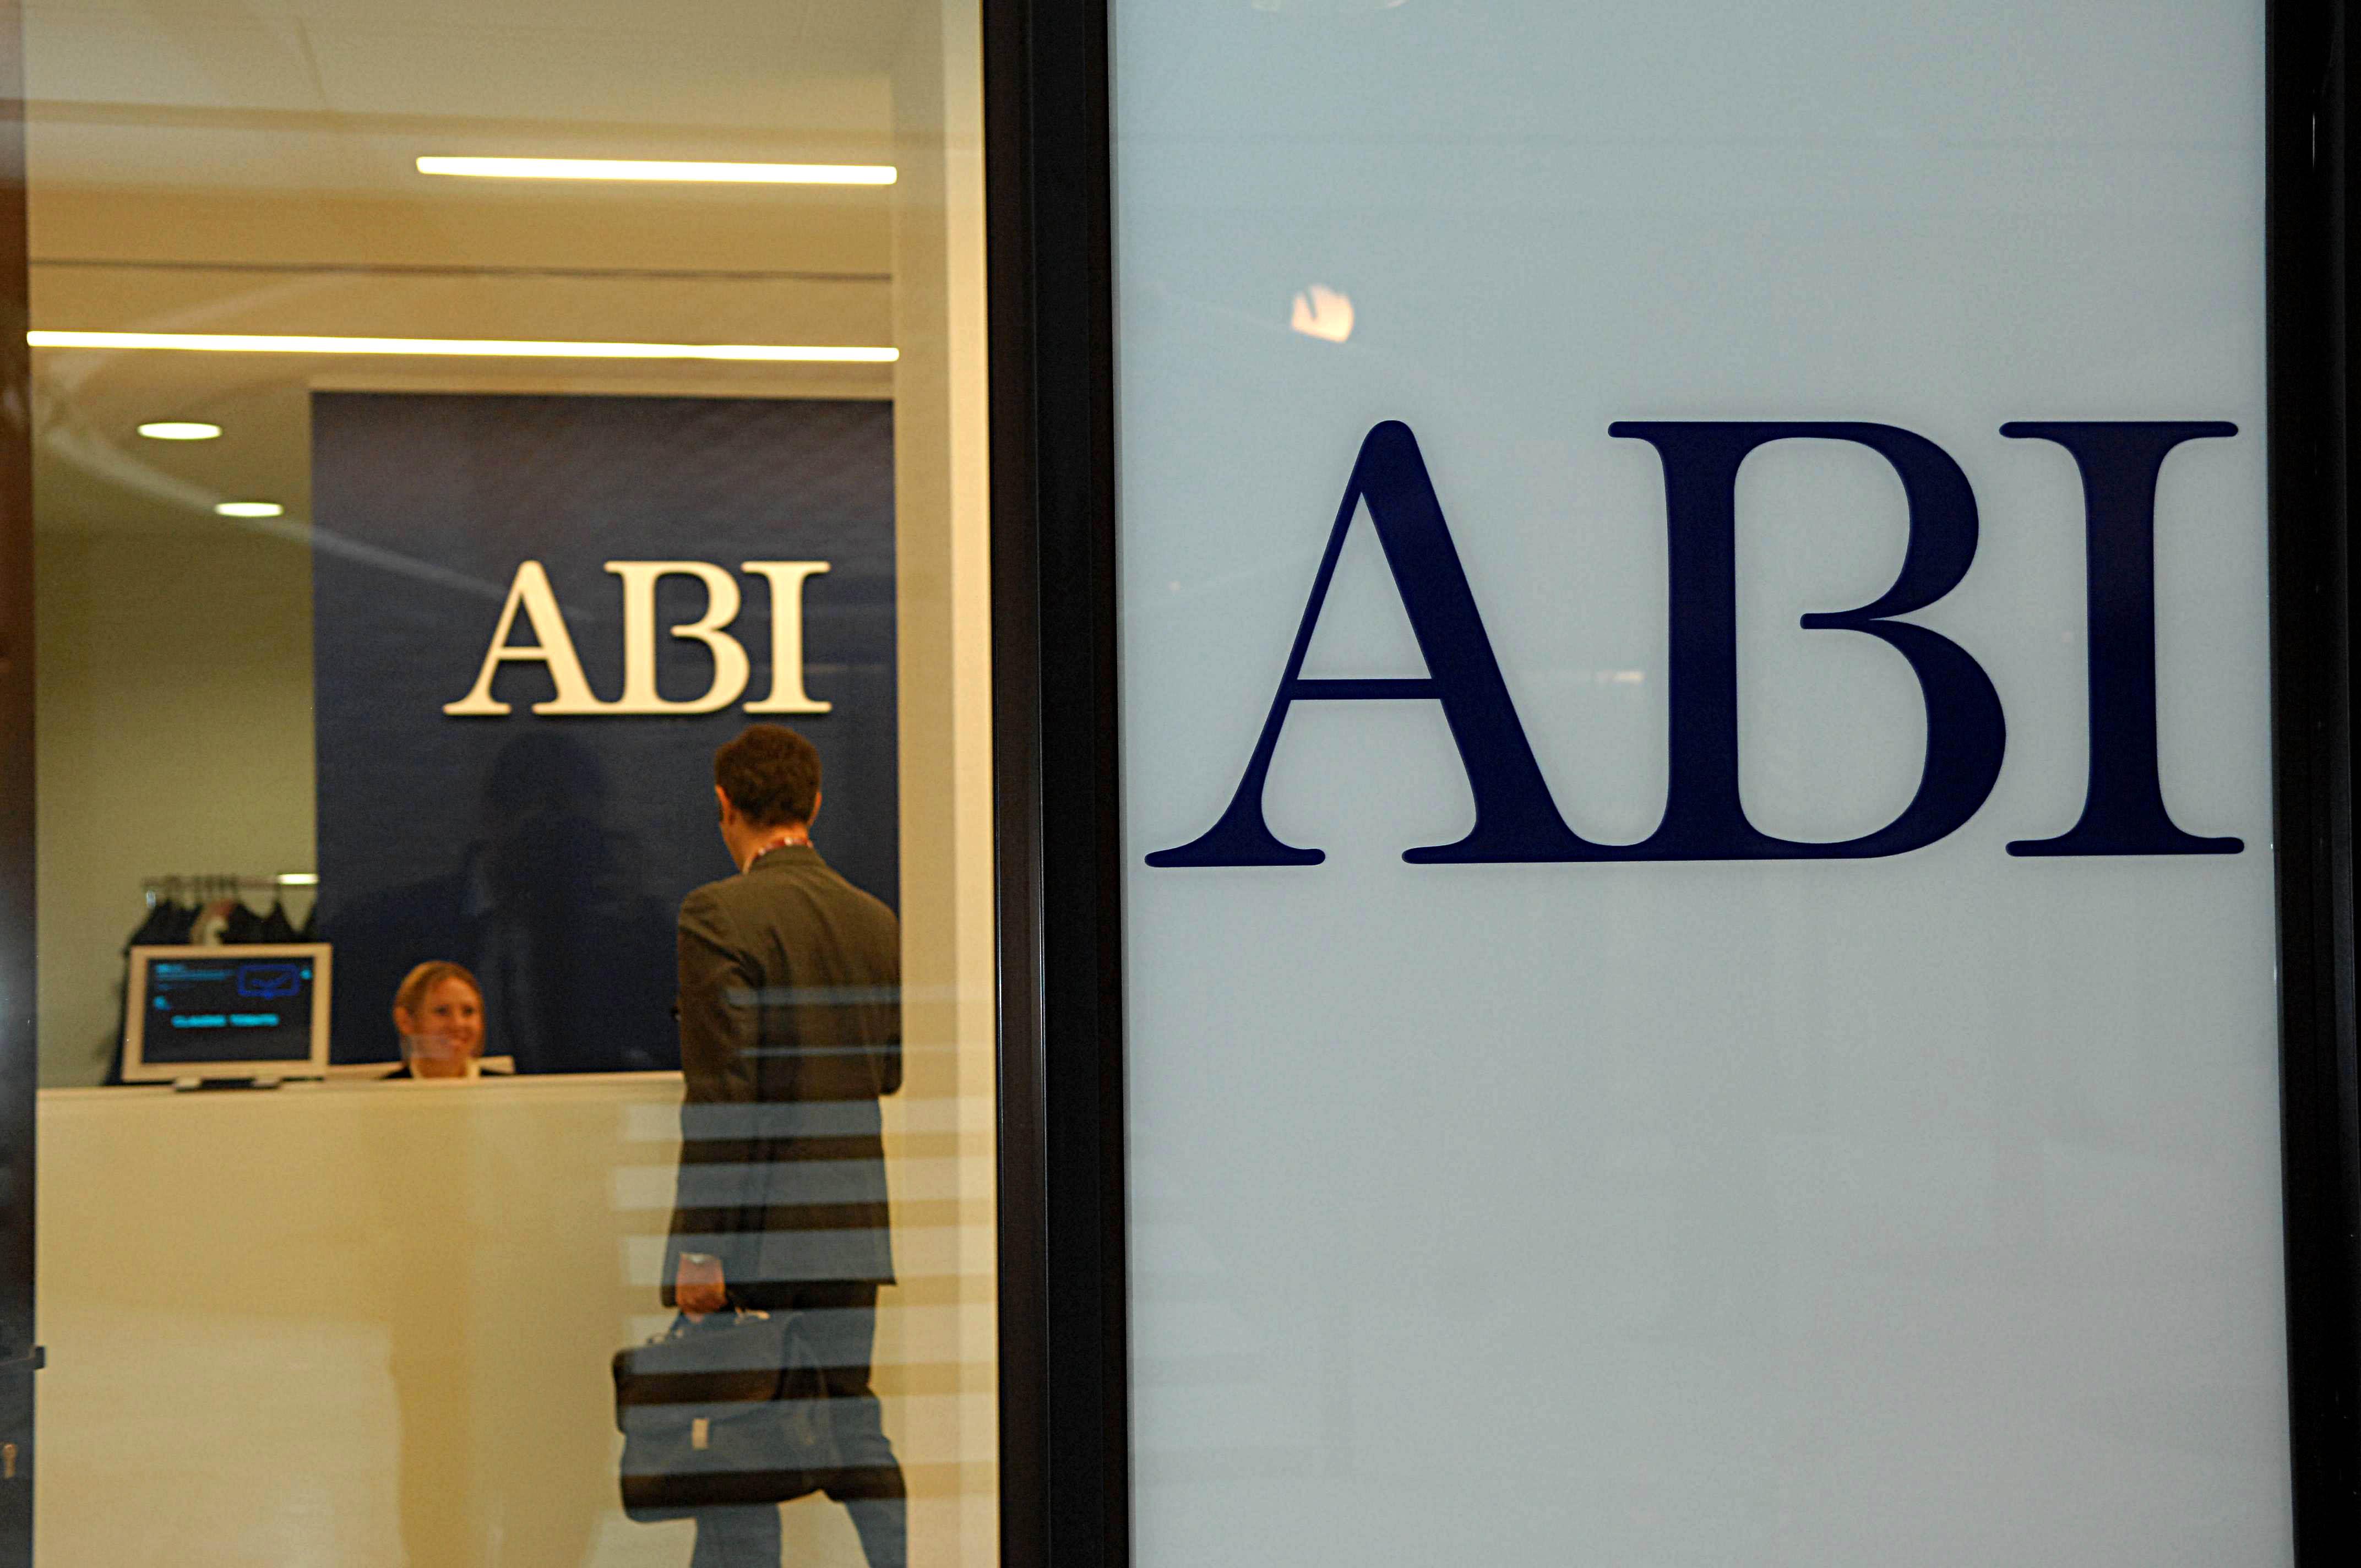 ABI blockchain, the second phase is underway